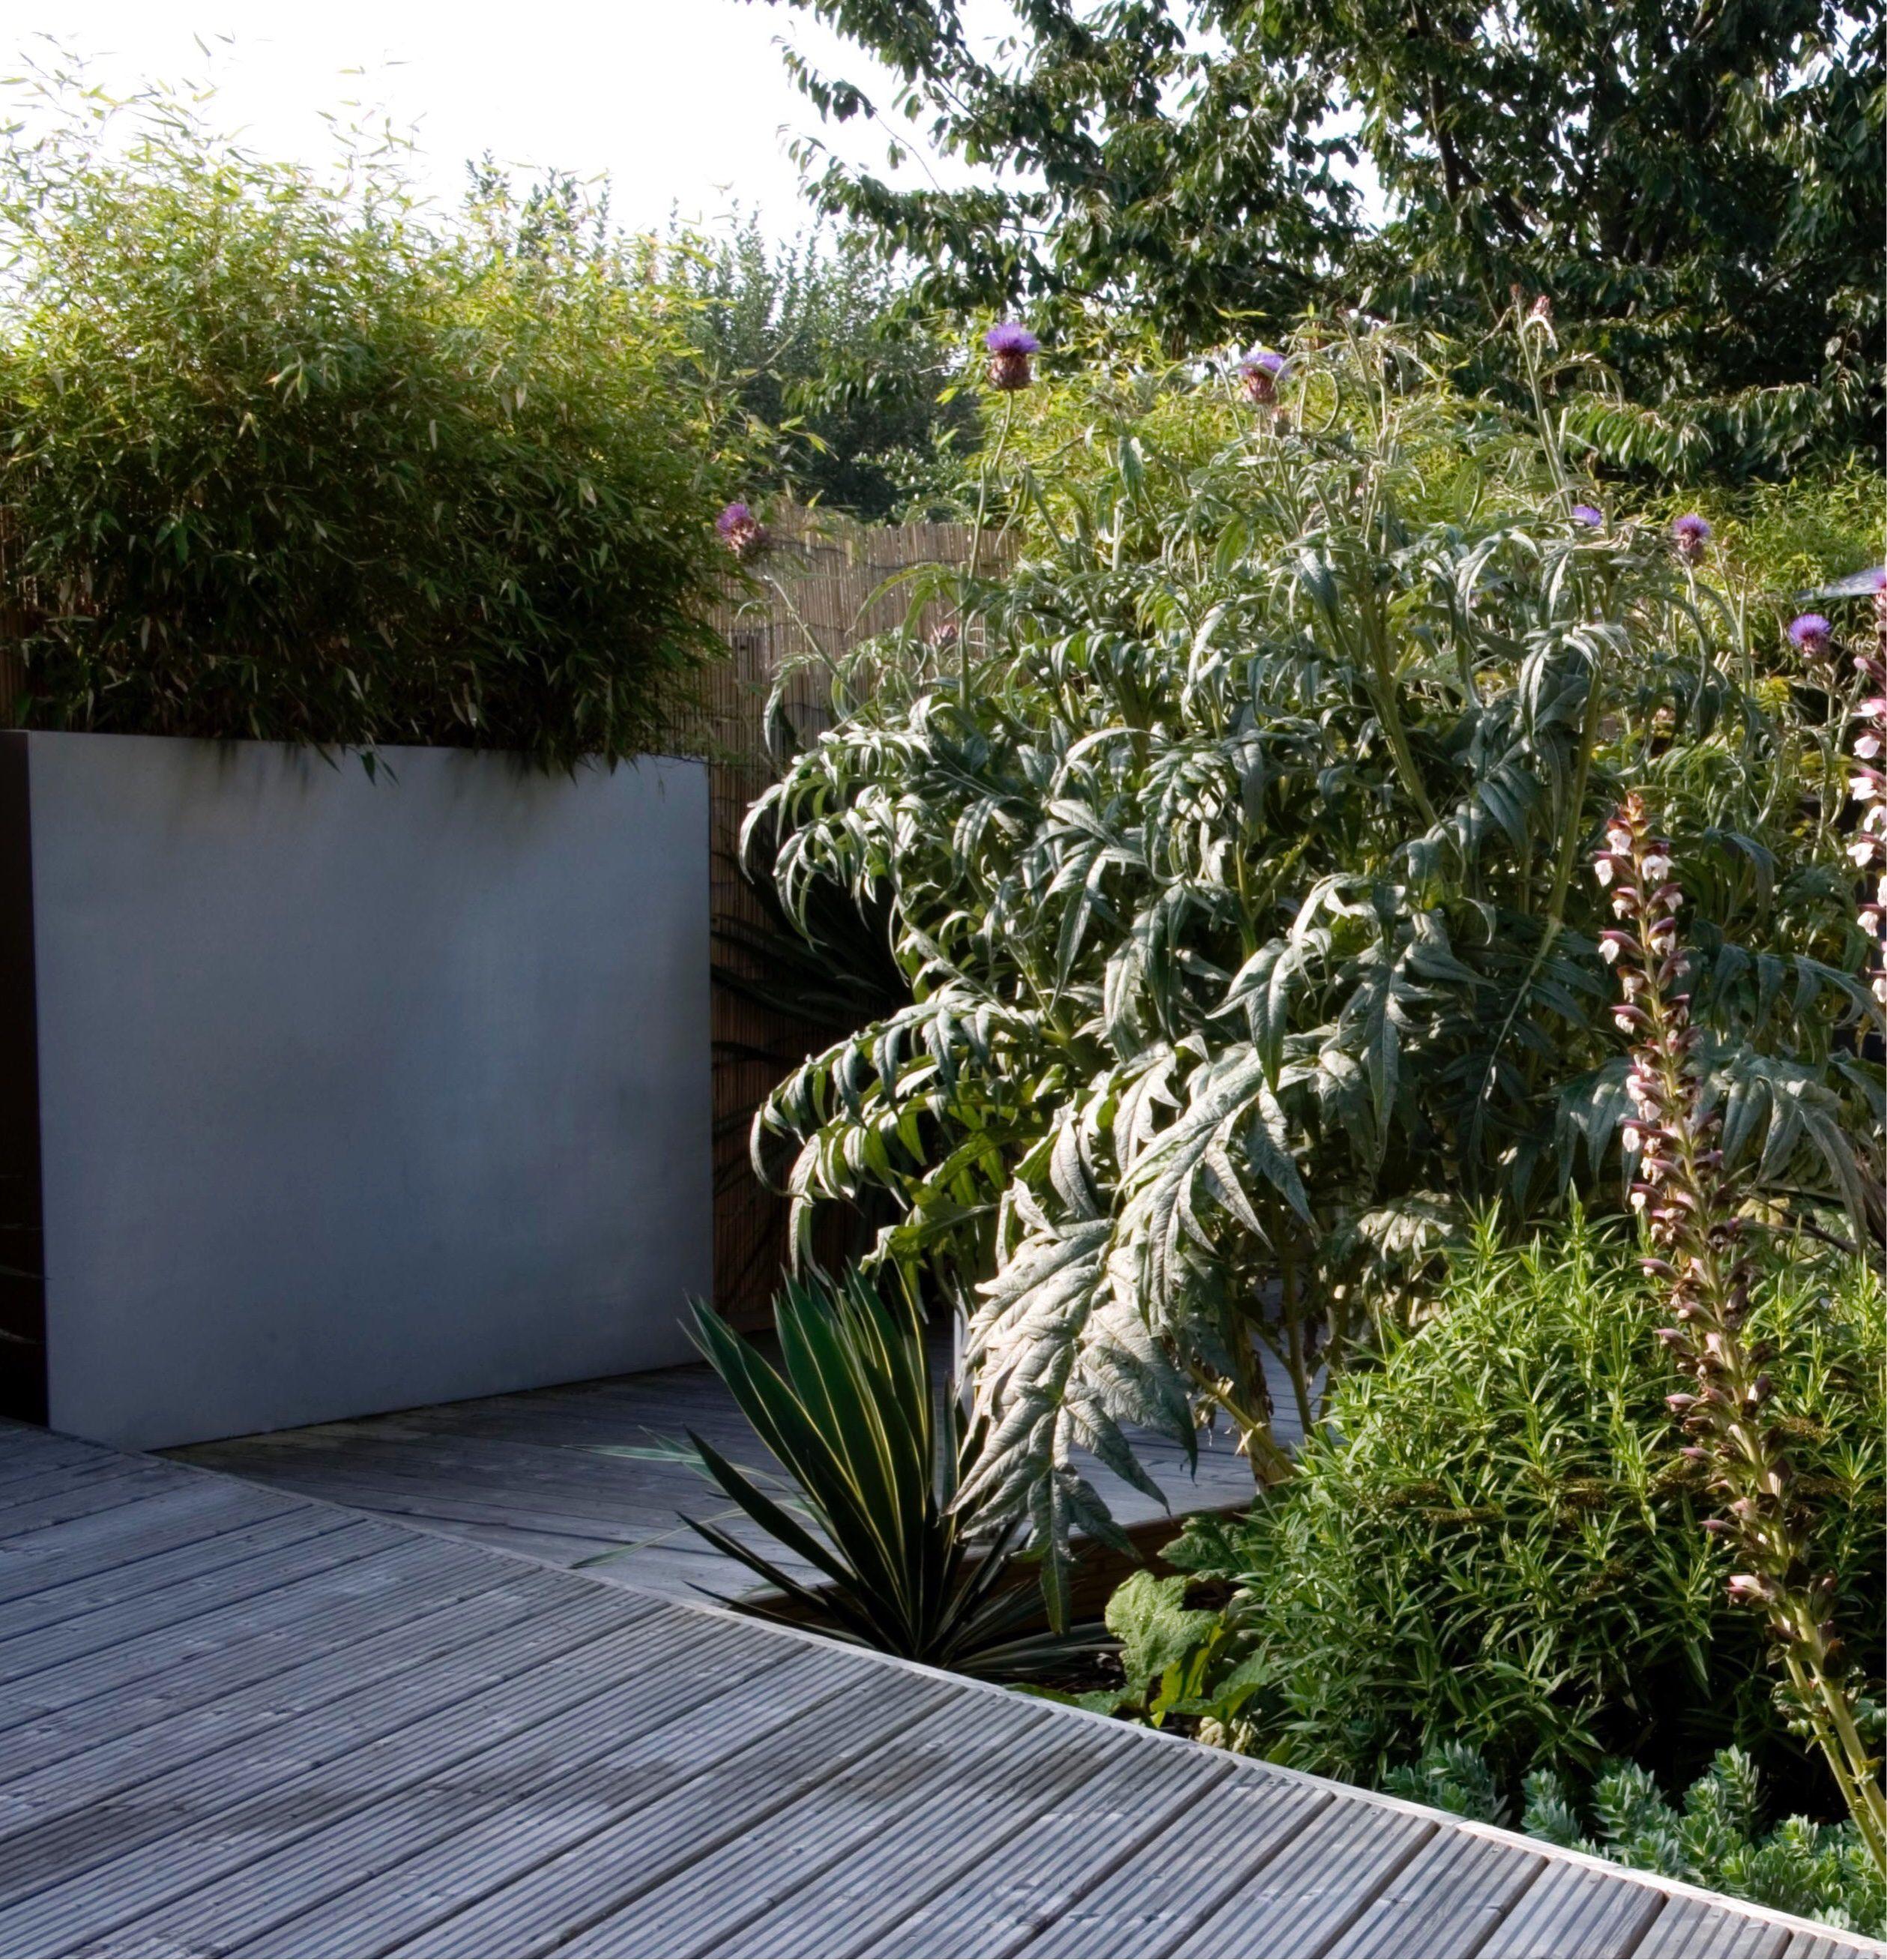 Garden layout design - planters always look good